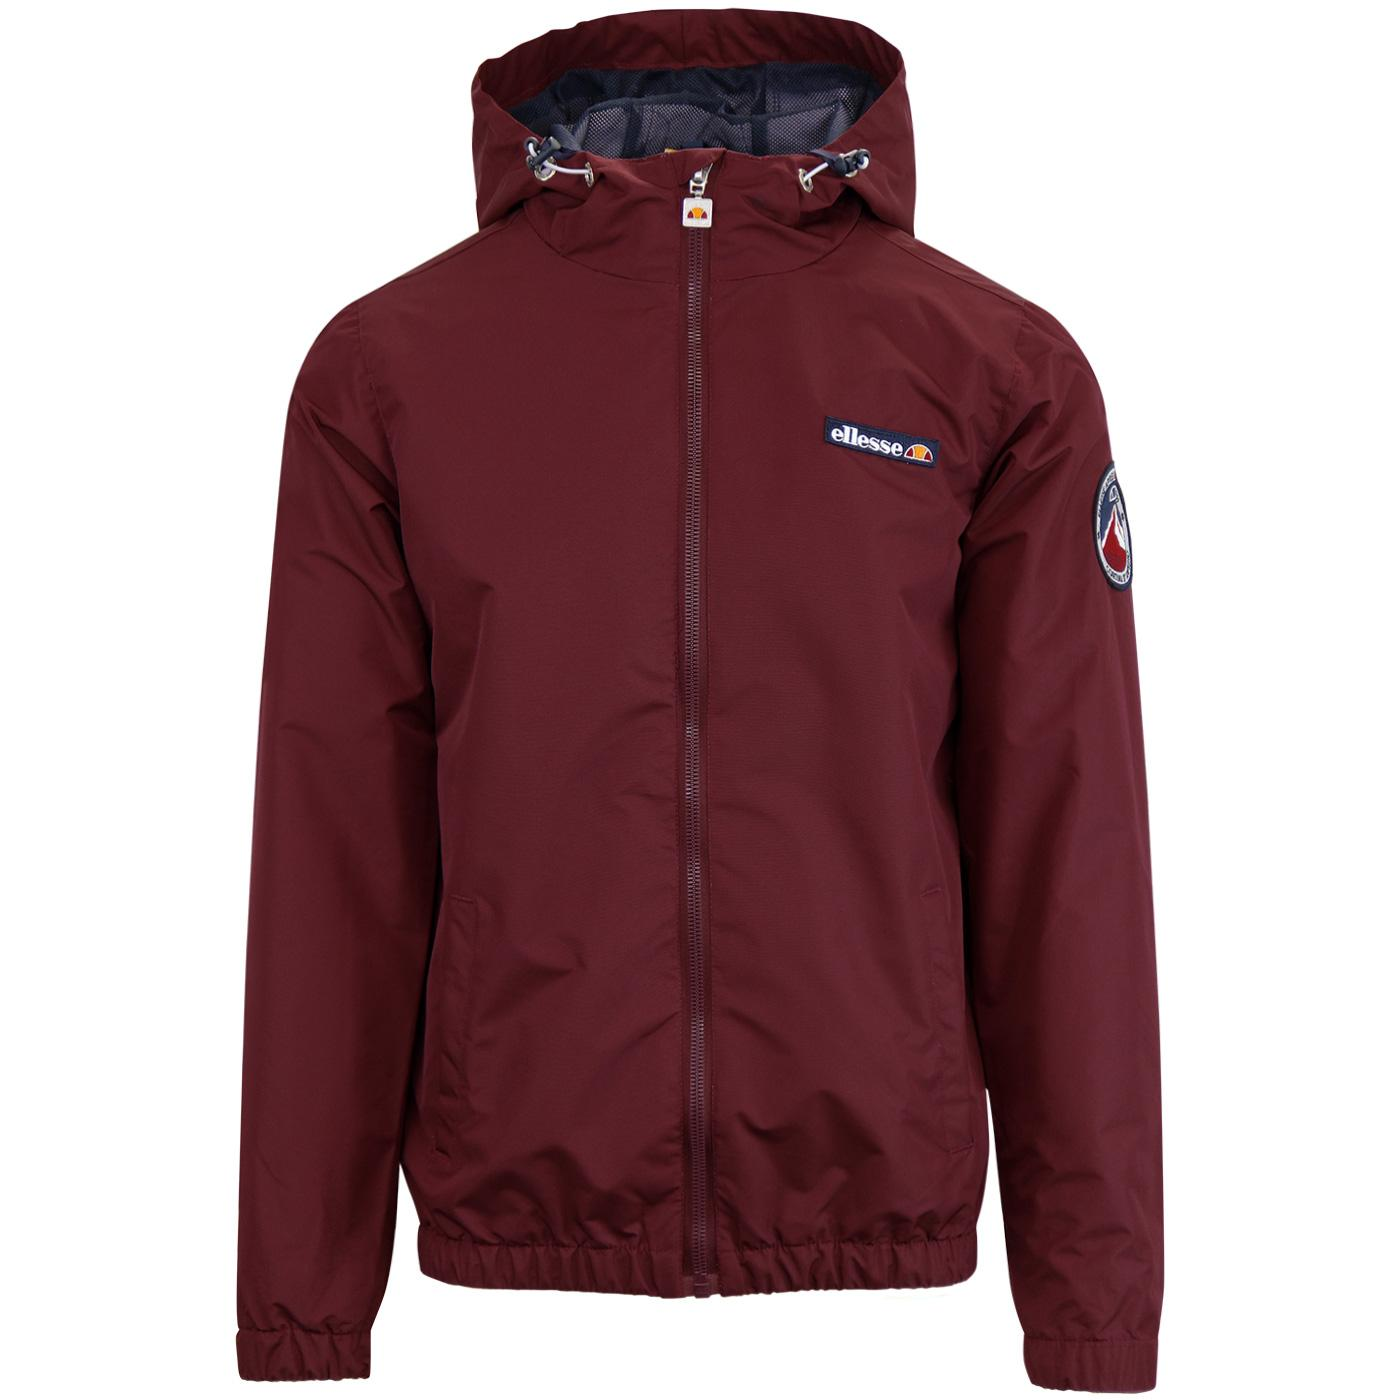 Terrazzo ELLESSE 80s Hooded Ski Jacket - Zinfandel